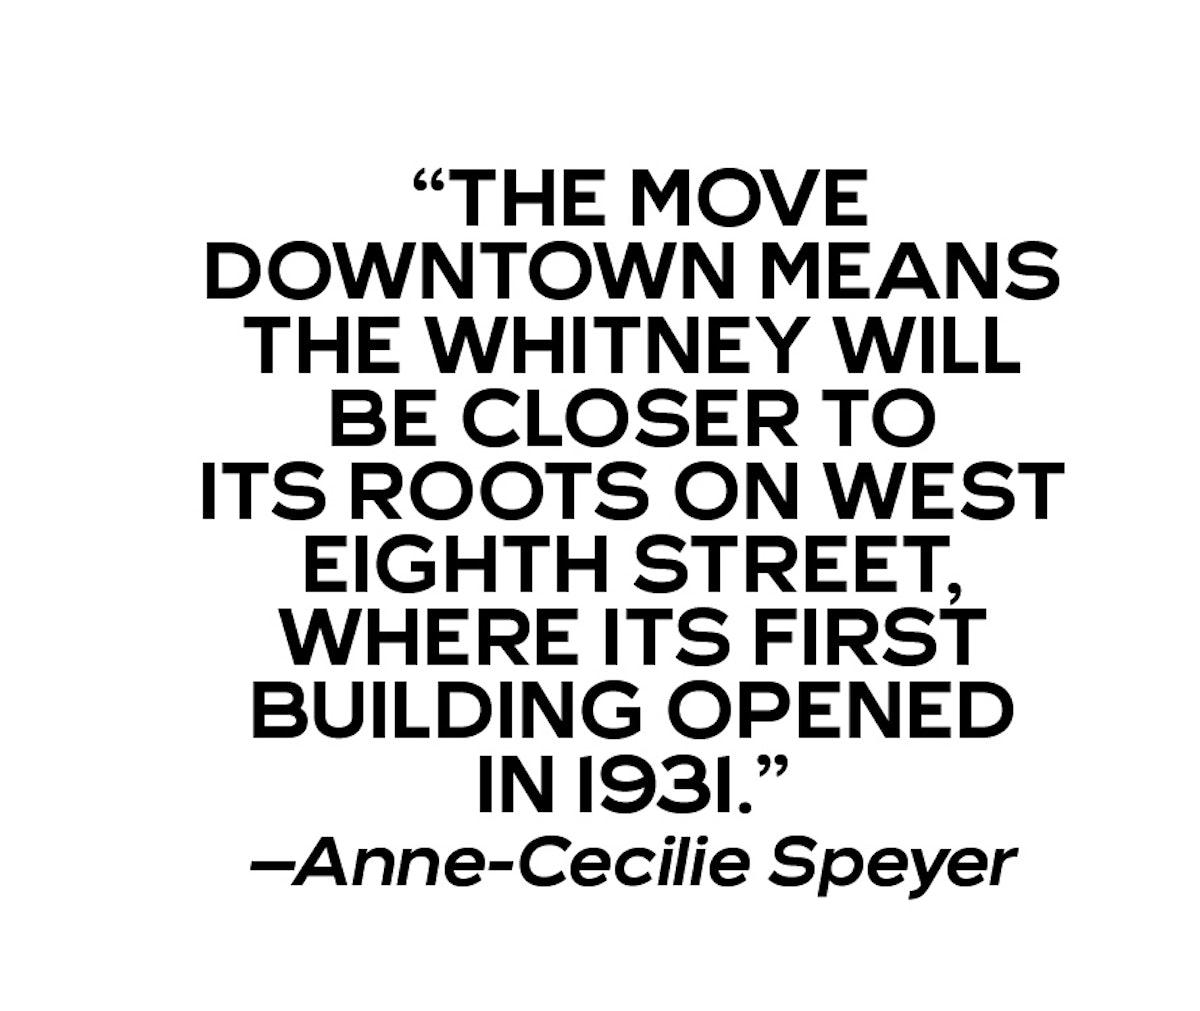 Anne-Cecilie Speyer